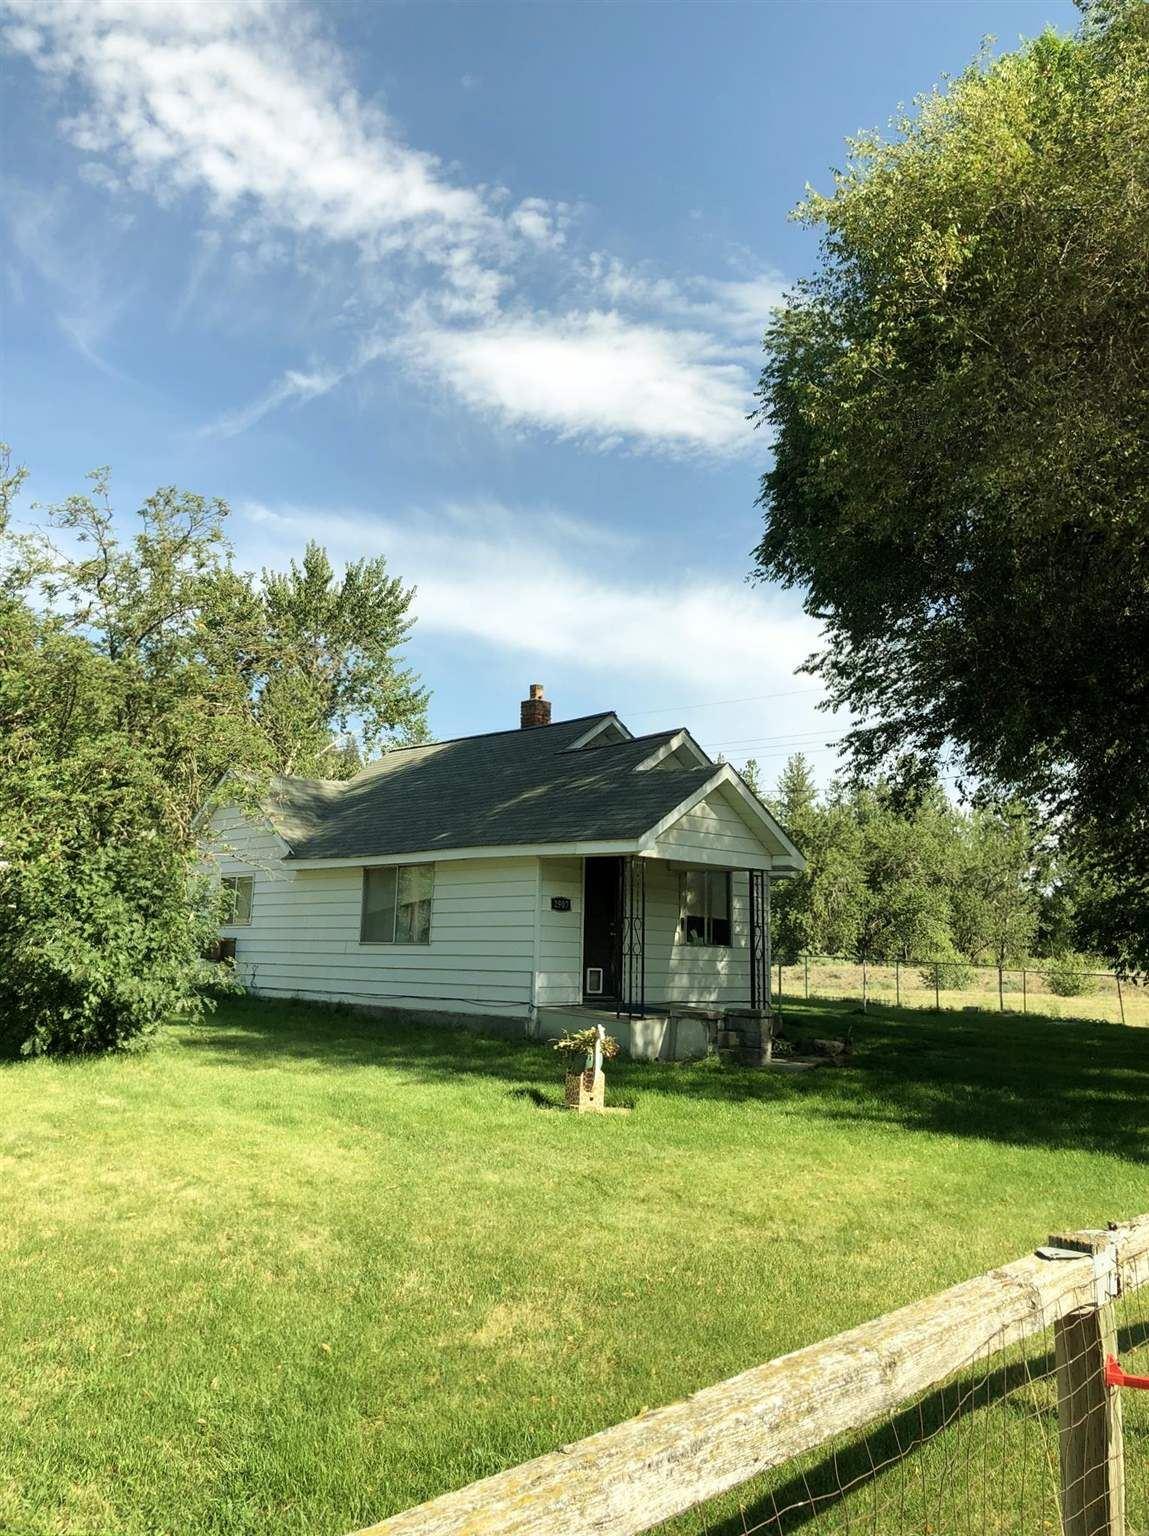 2907 S Oak St, Spokane, WA 99224 - #: 202117820